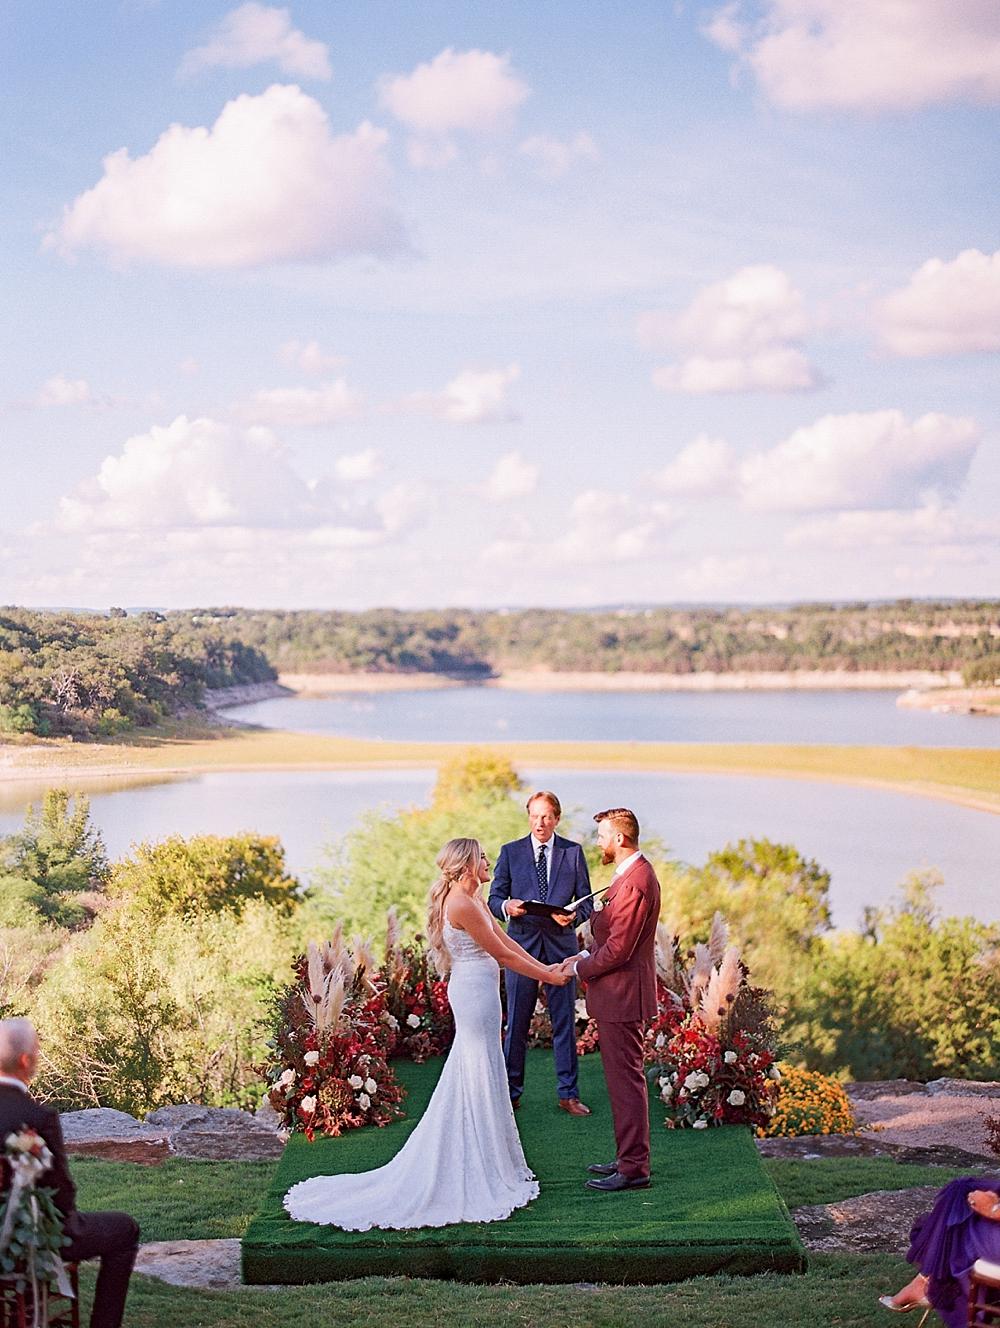 kristin-la-voie-photography-AUSTIN-WEDDING-PHOTOGRAPHER-BEST-IN-TEXAS-11